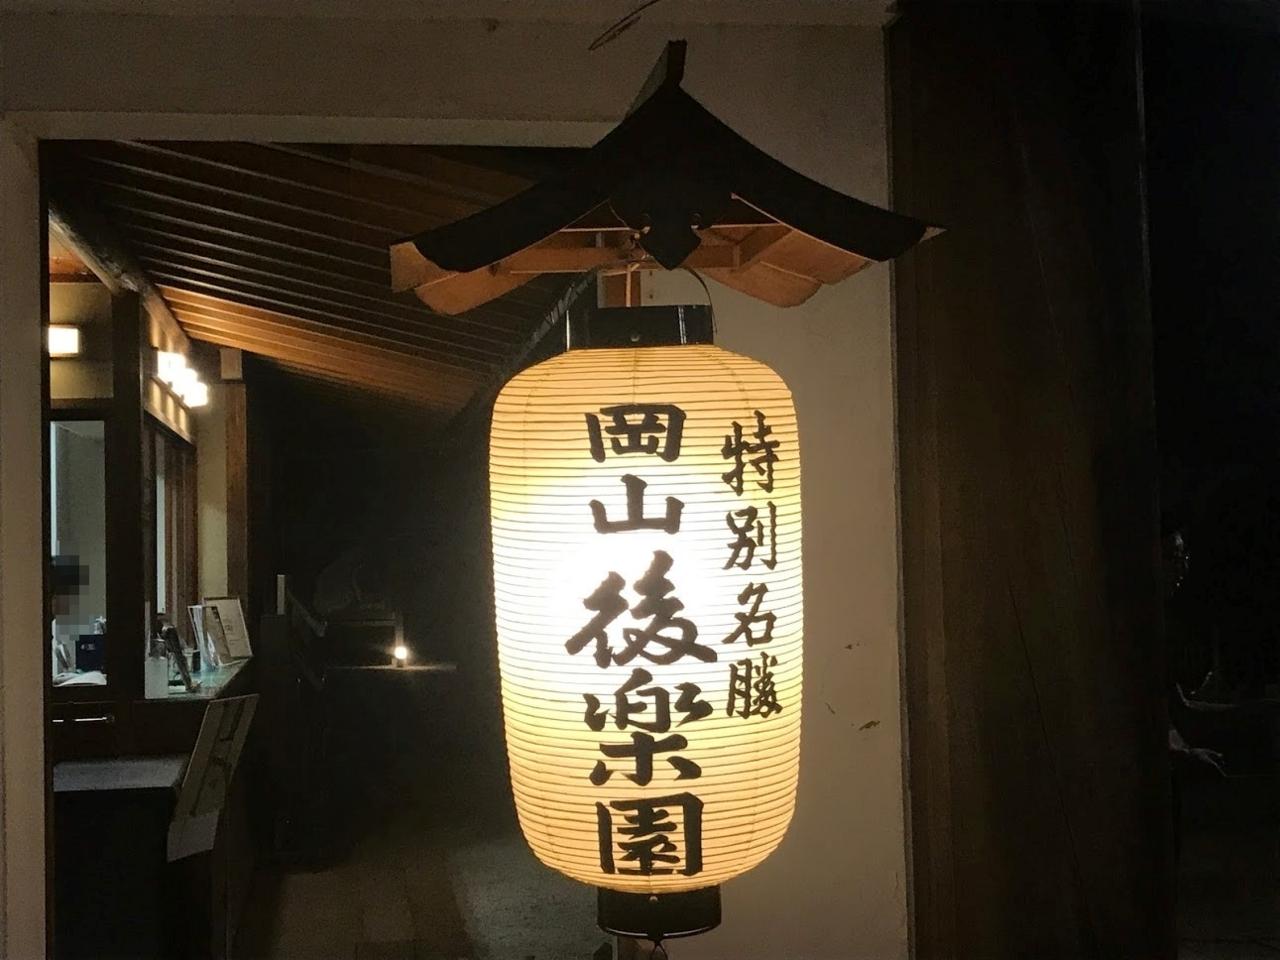 f:id:okayama_writers:20180820043528j:plain